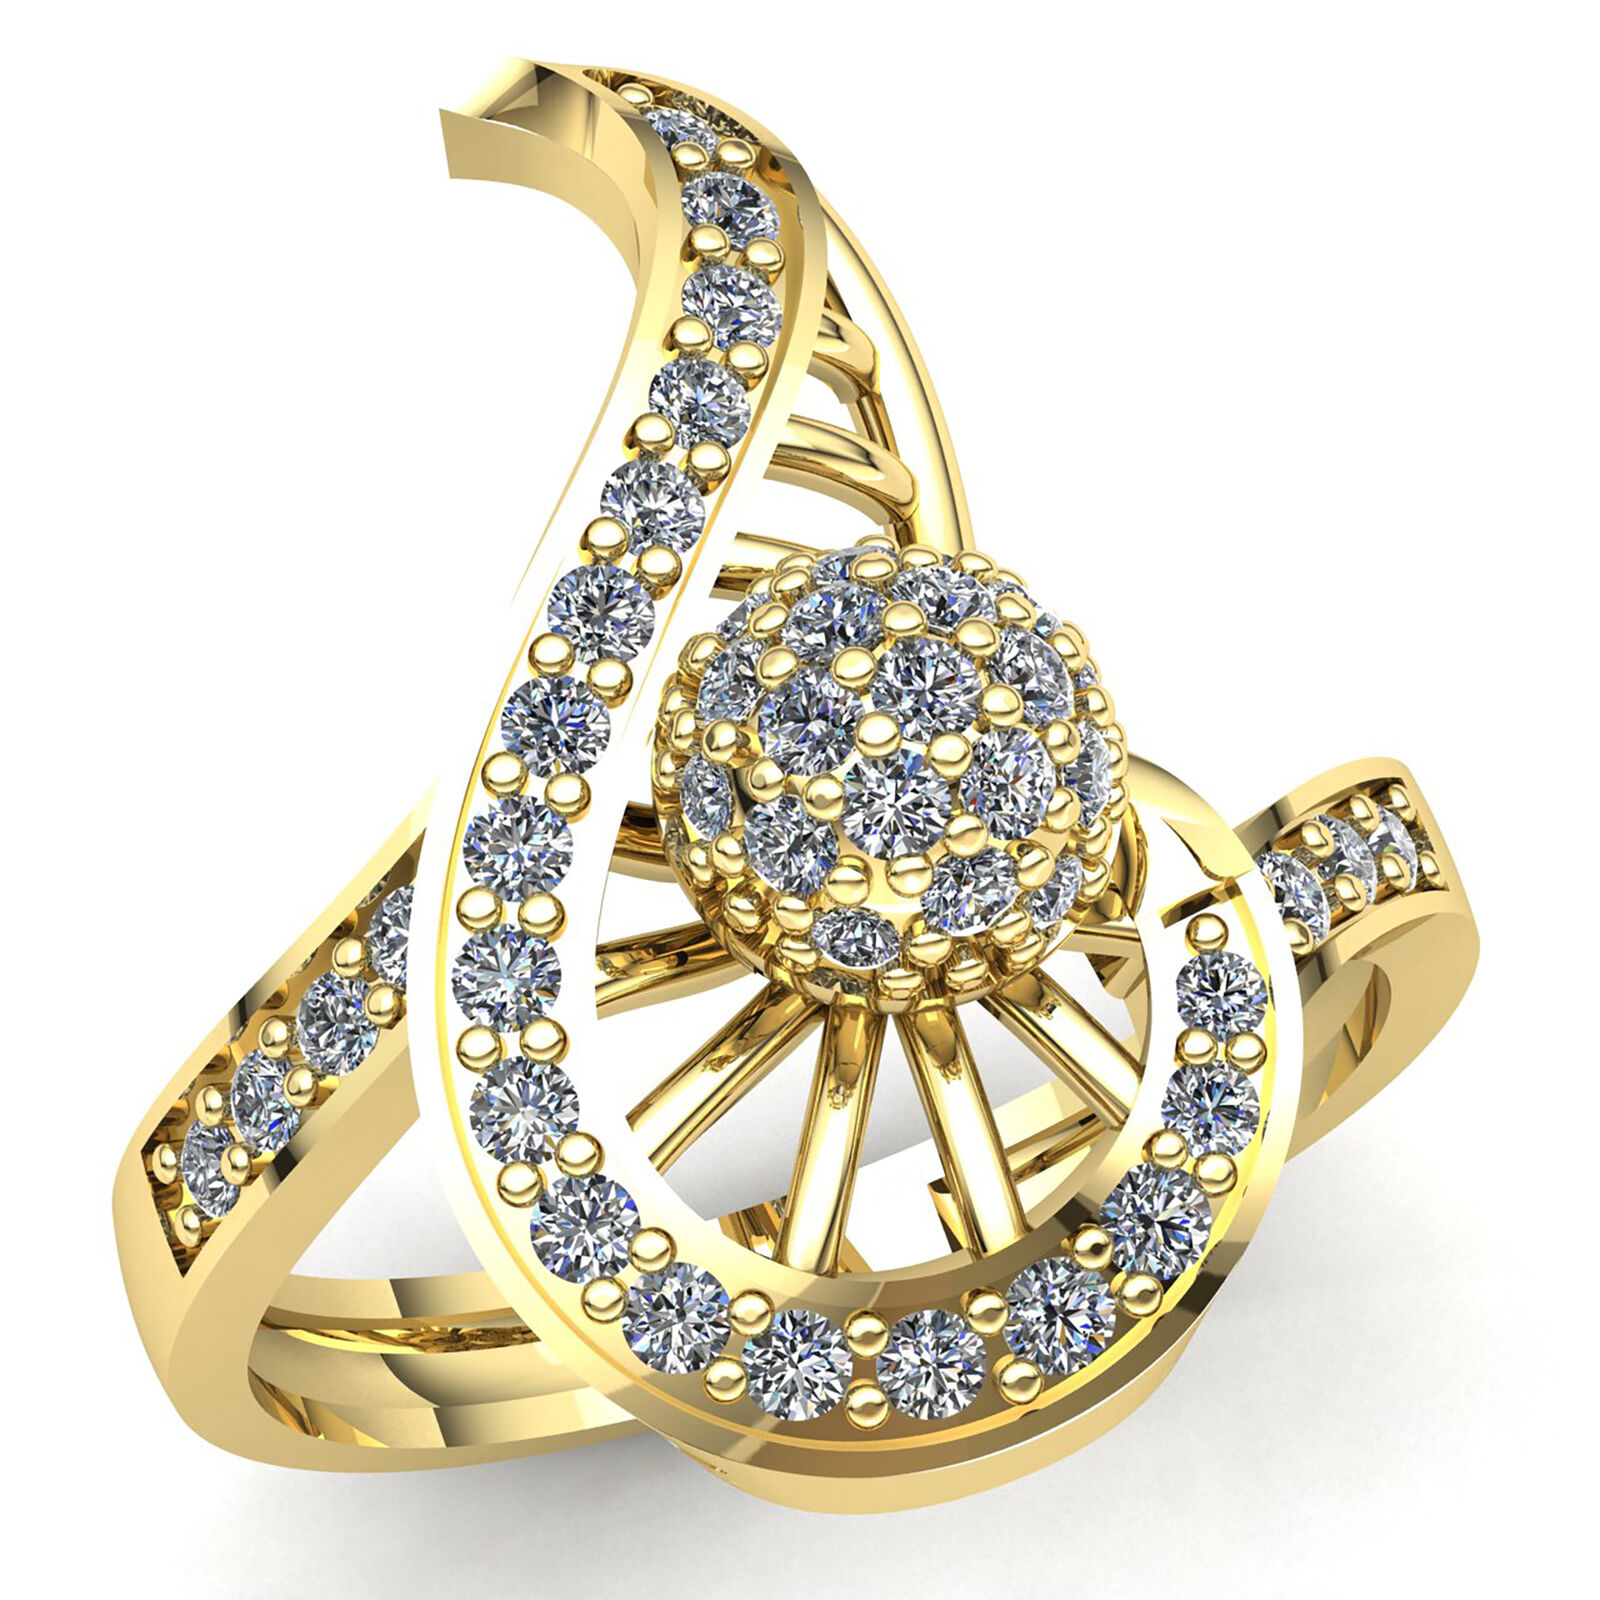 Real 1.5carat Round Cut Diamond Ladies Cluster Vintage Engagement Ring 14K gold